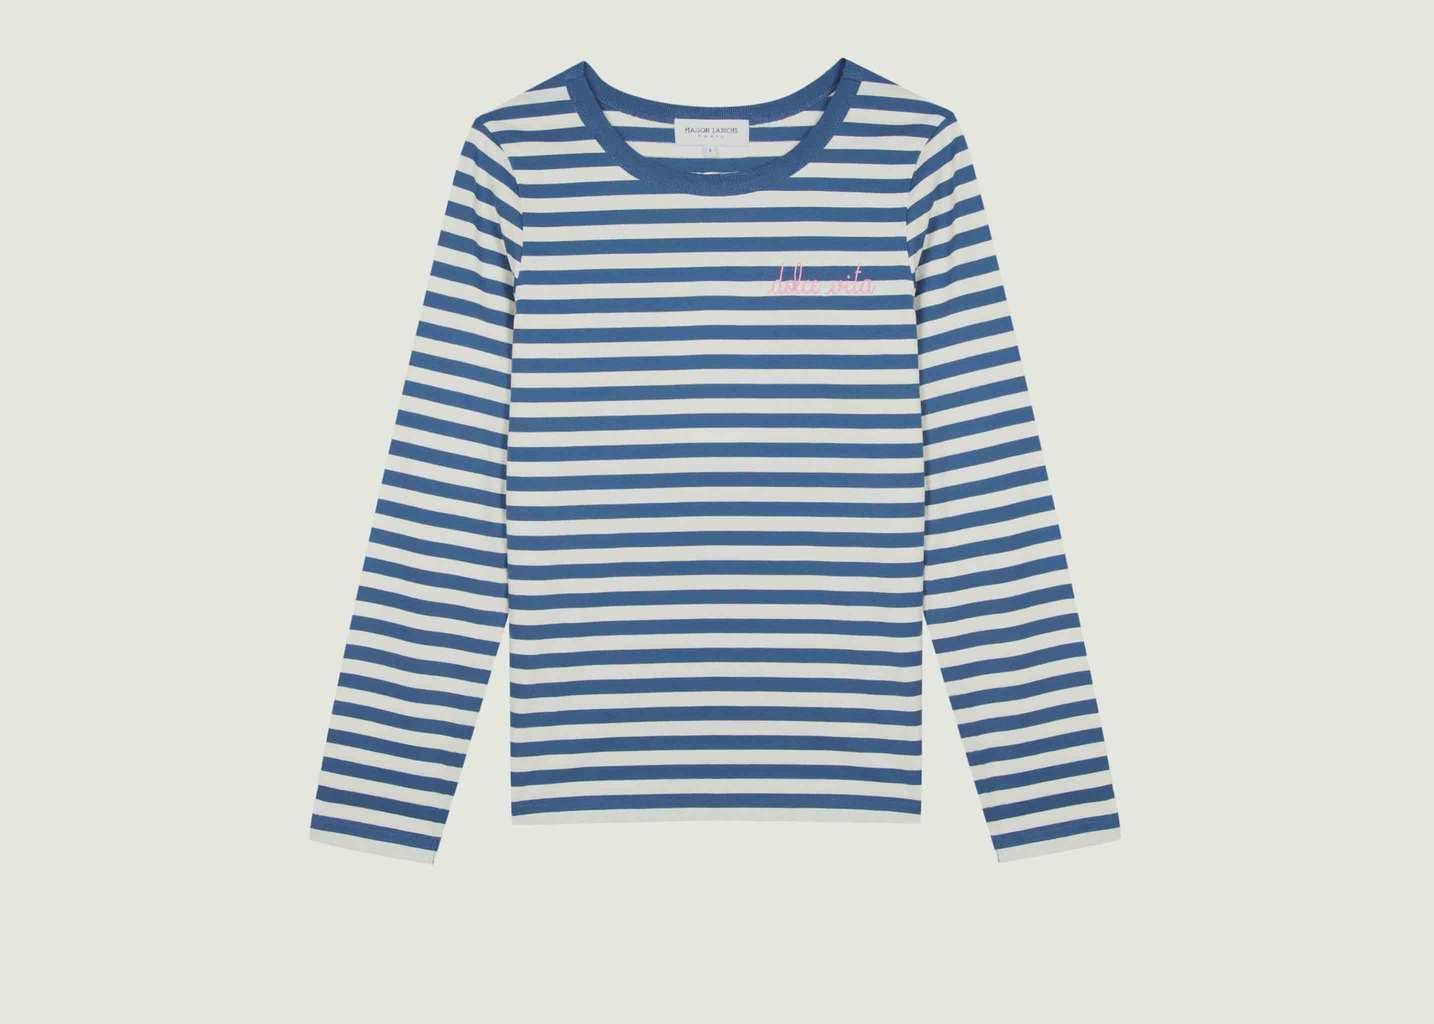 T-shirt Dolce Vita - Maison Labiche